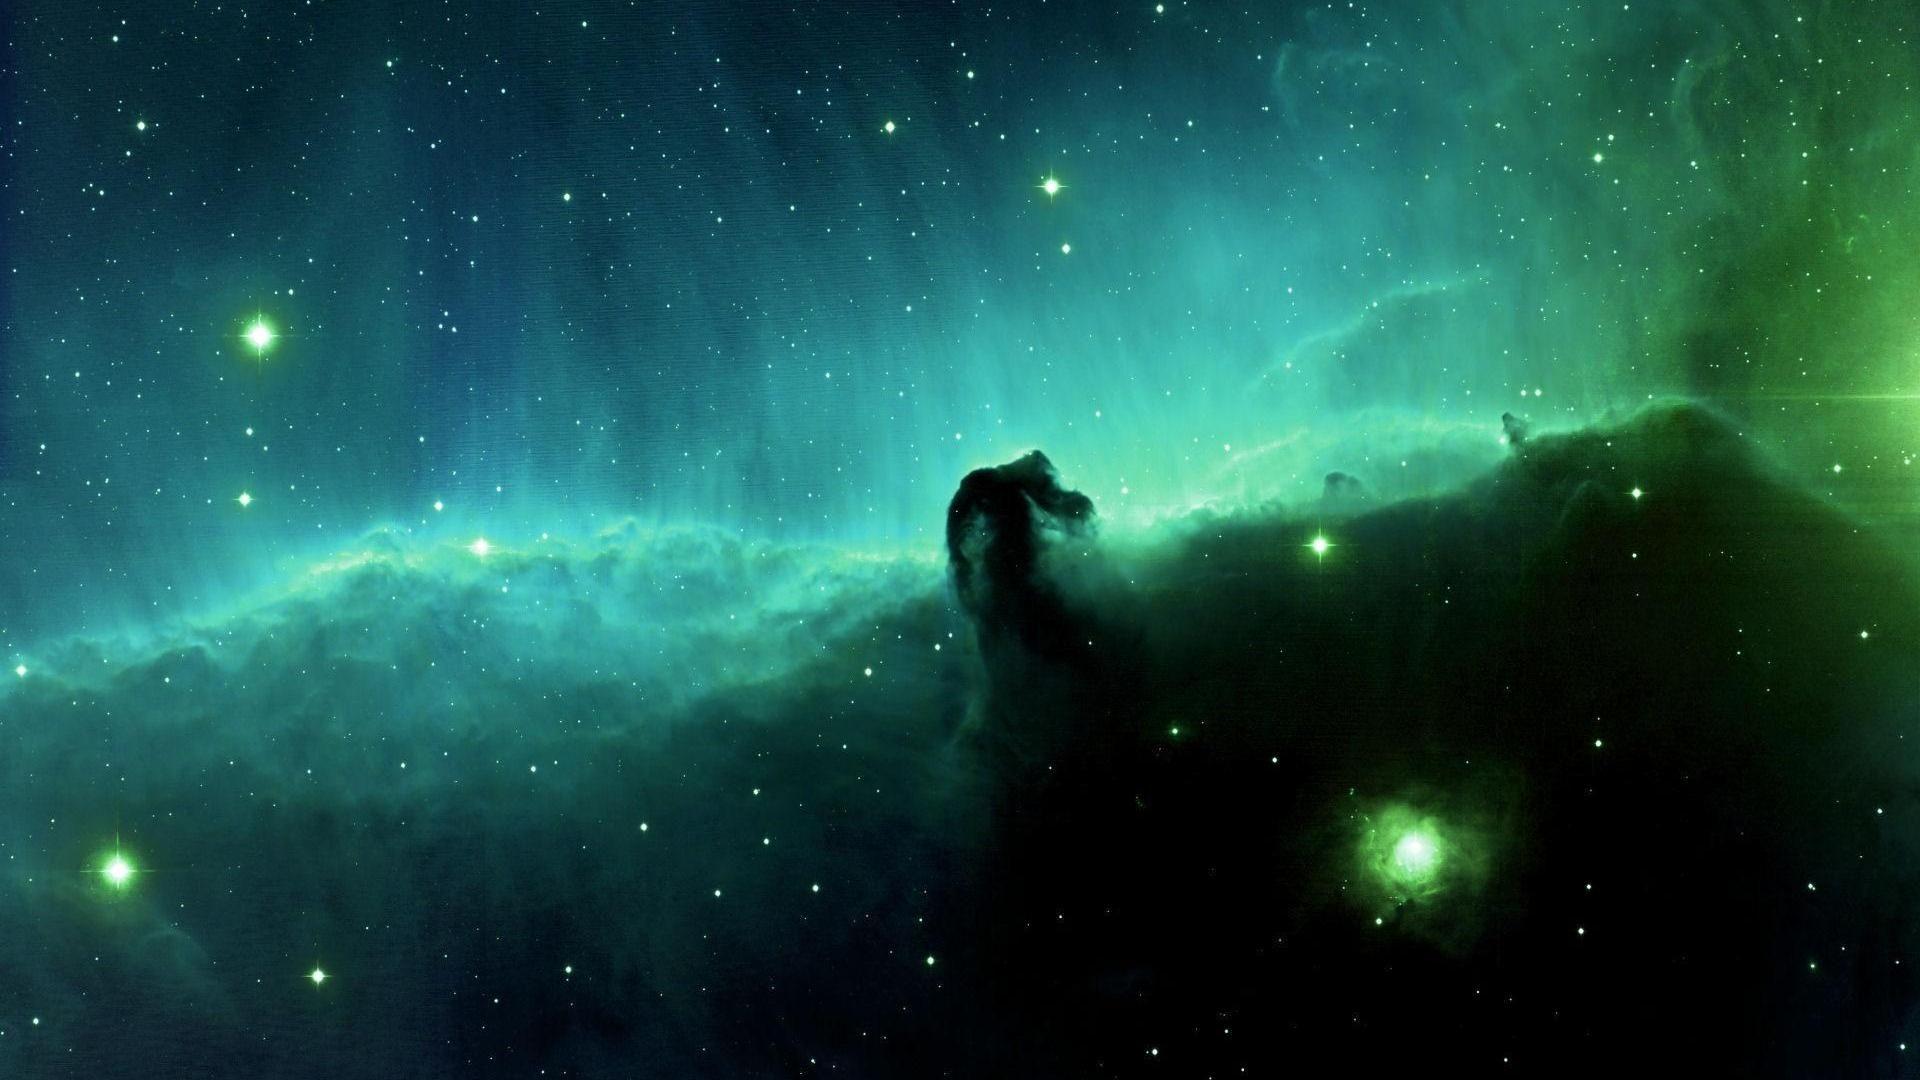 Ios 7 Iphone Wallpaper: 1920x1080-space_nebula_horsehead_nebula-12735.jpg (1920